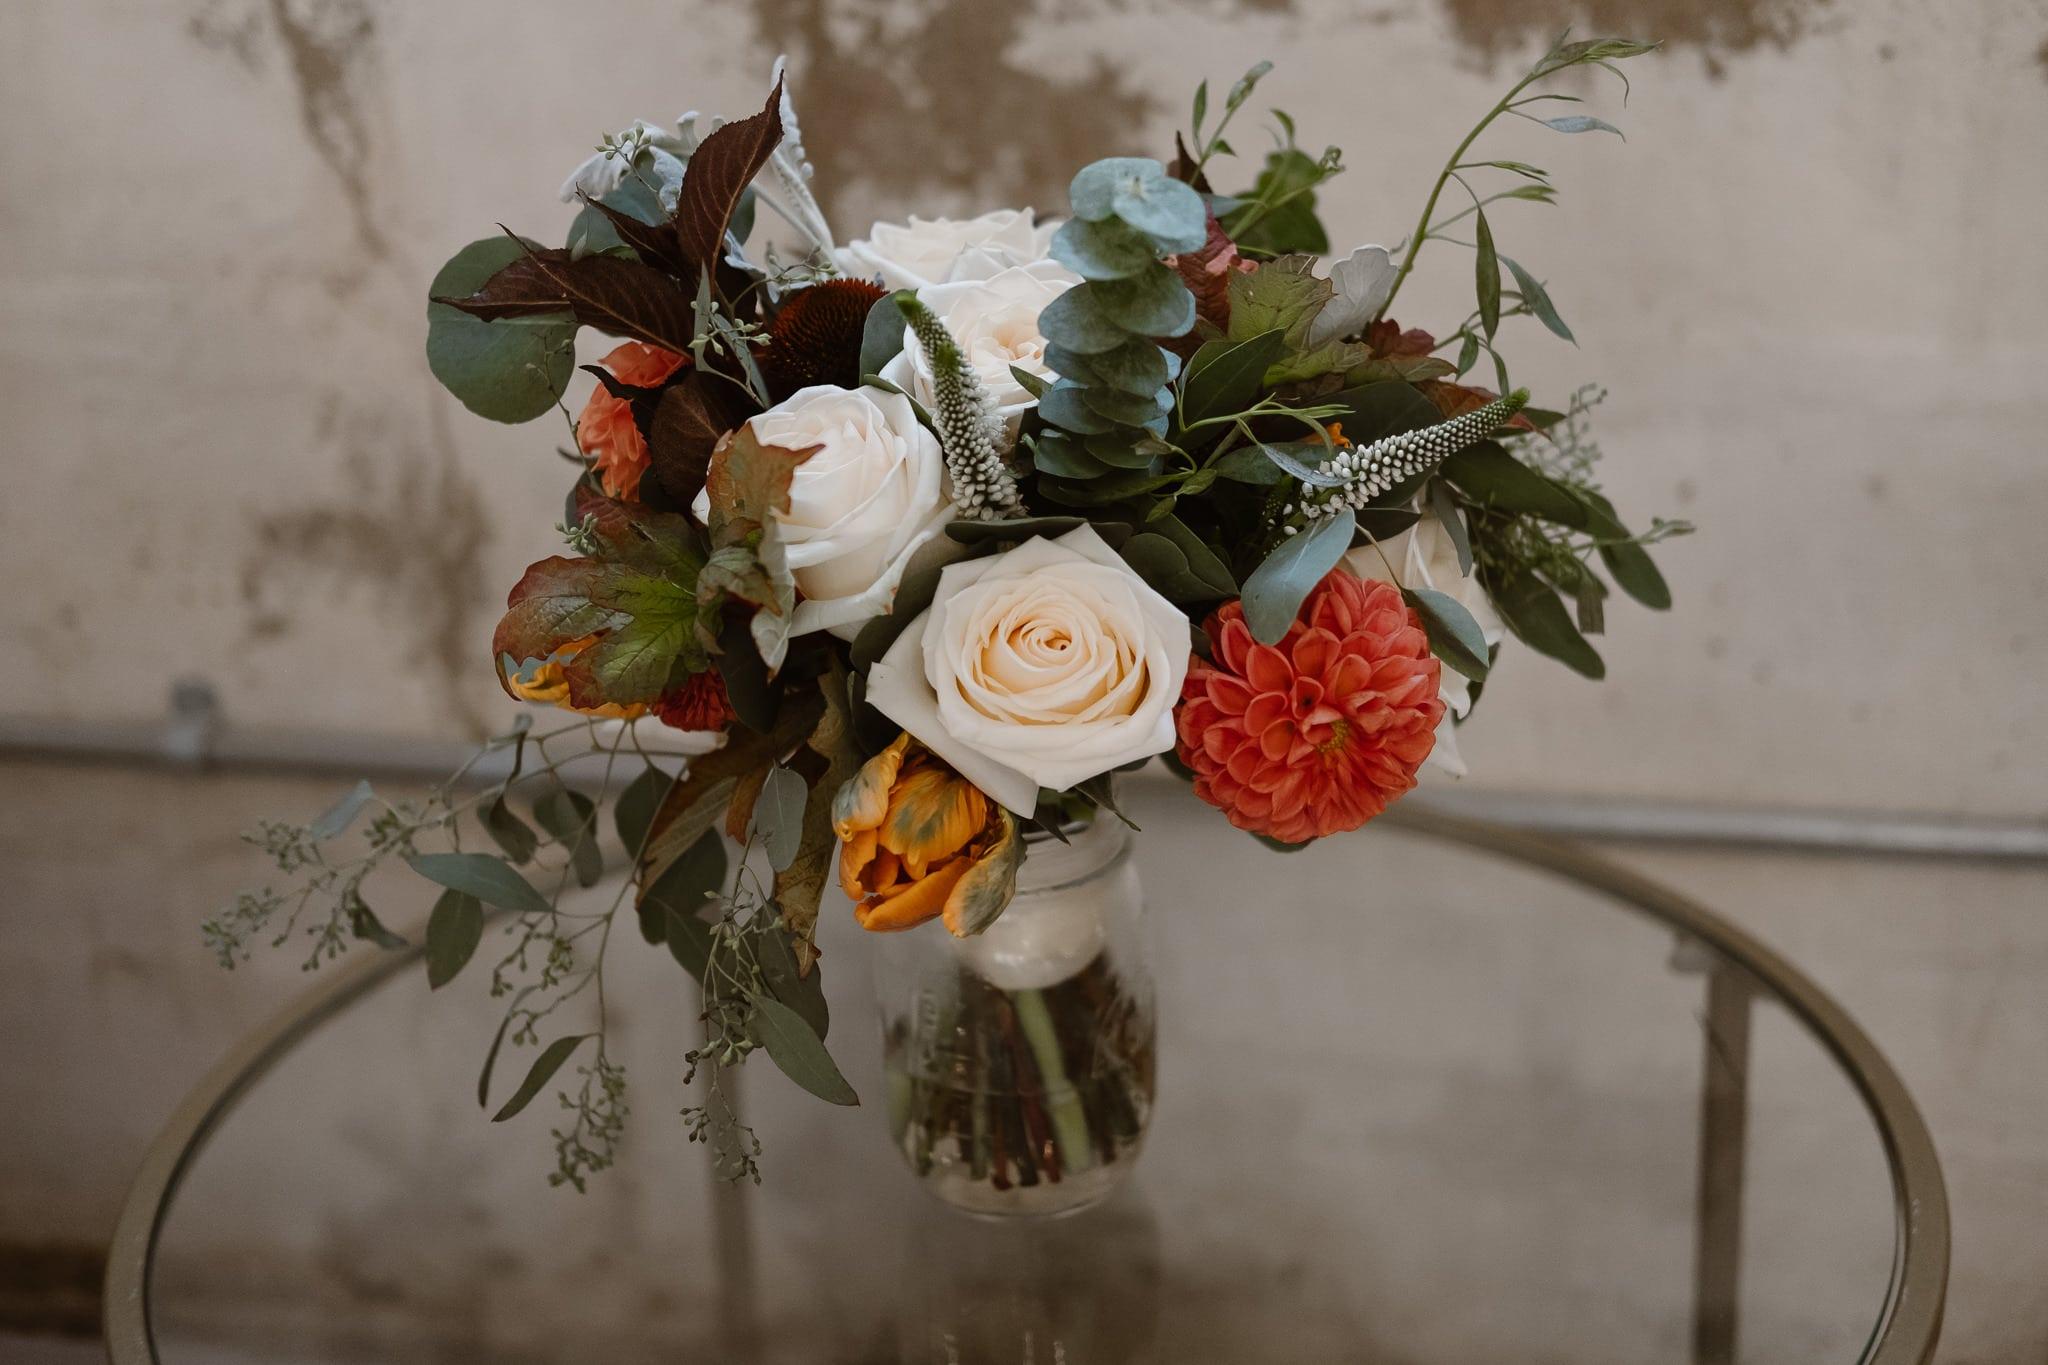 St Vrain Wedding Photographer | Longmont Wedding Photographer | Colorado Winter Wedding Photographer, Colorado industrial chic wedding, bride's bouquet